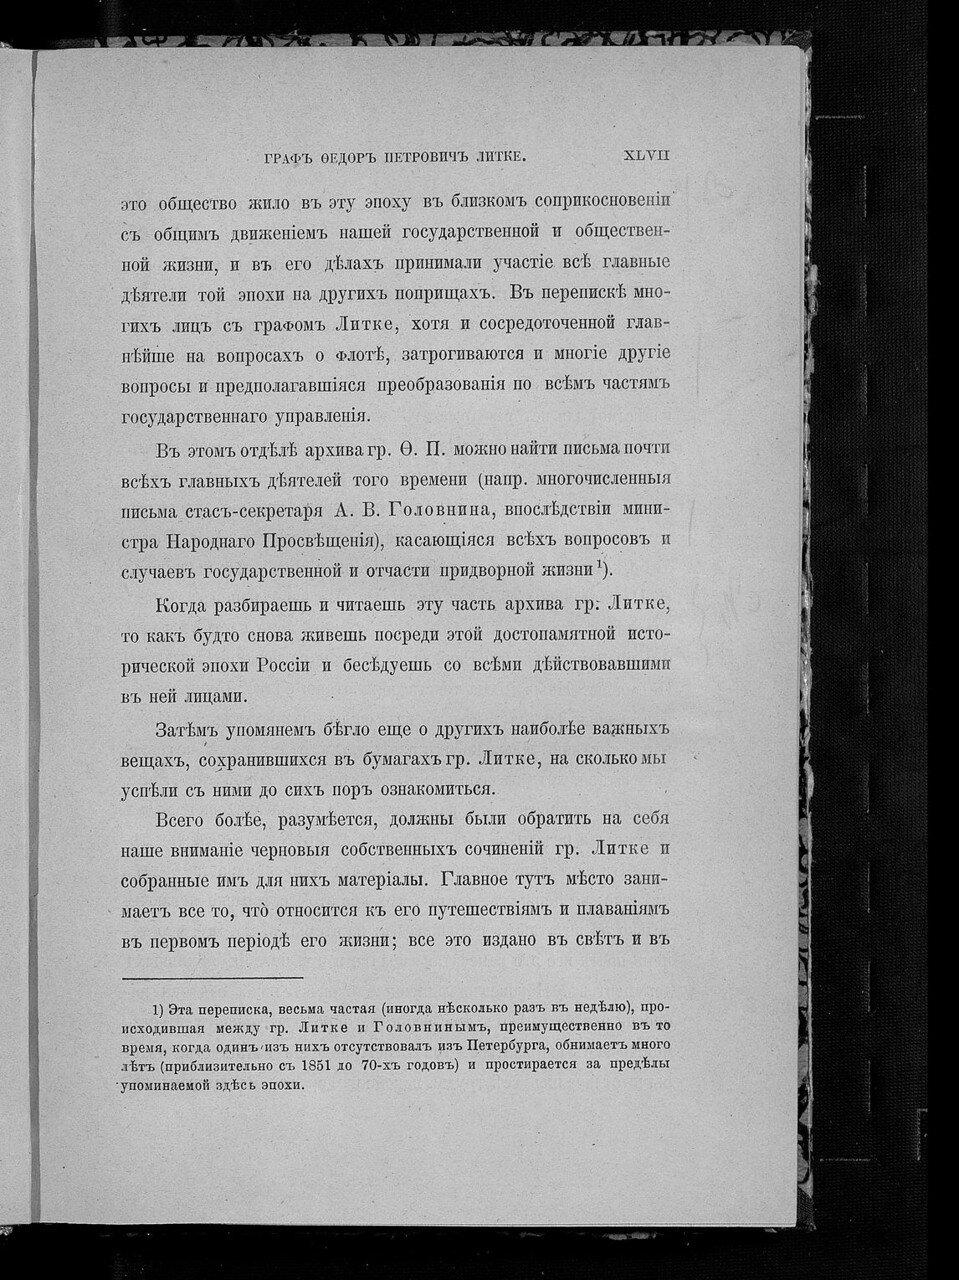 https://img-fotki.yandex.ru/get/362196/199368979.d3/0_21dd81_3e043f96_XXXL.jpg